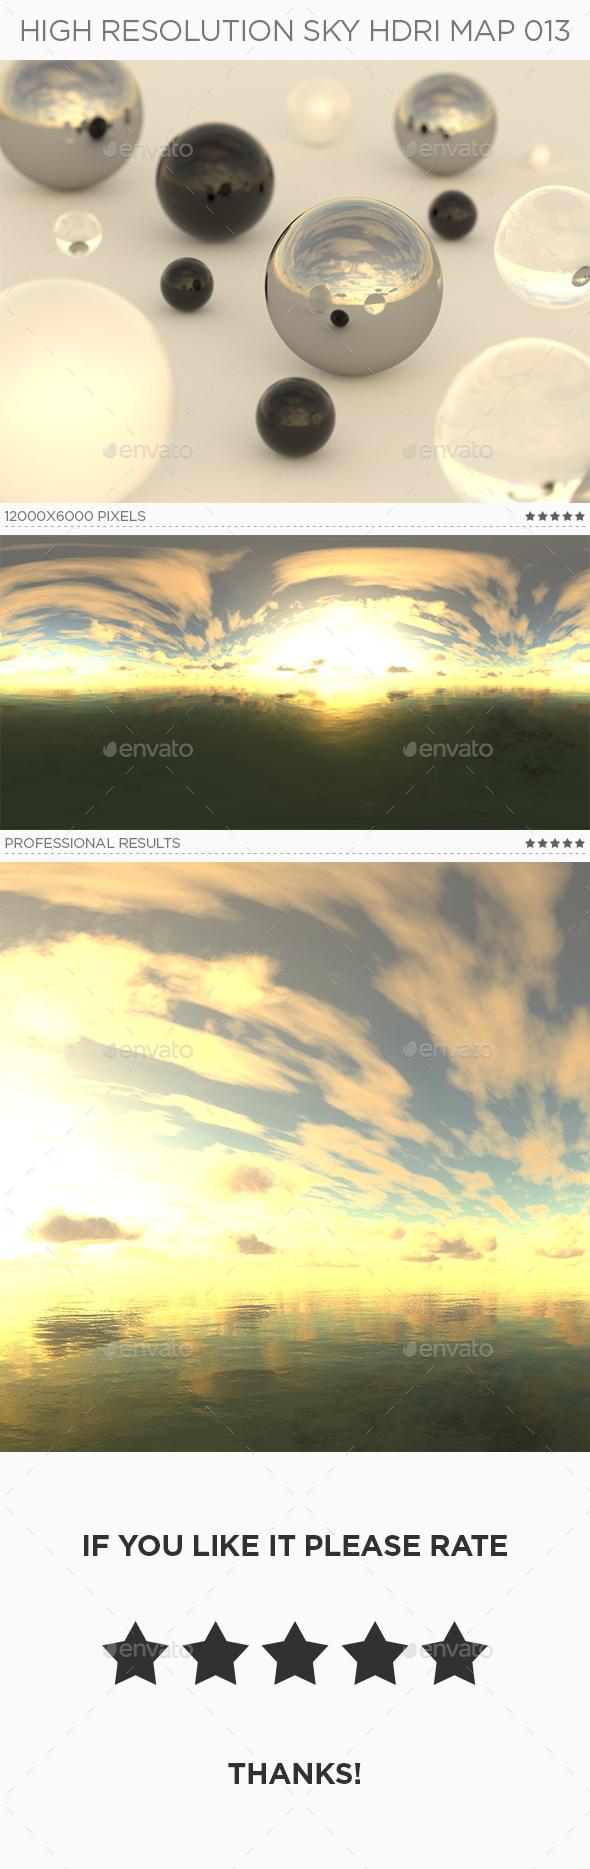 High Resolution Sky HDRi Map 013 - 3DOcean Item for Sale